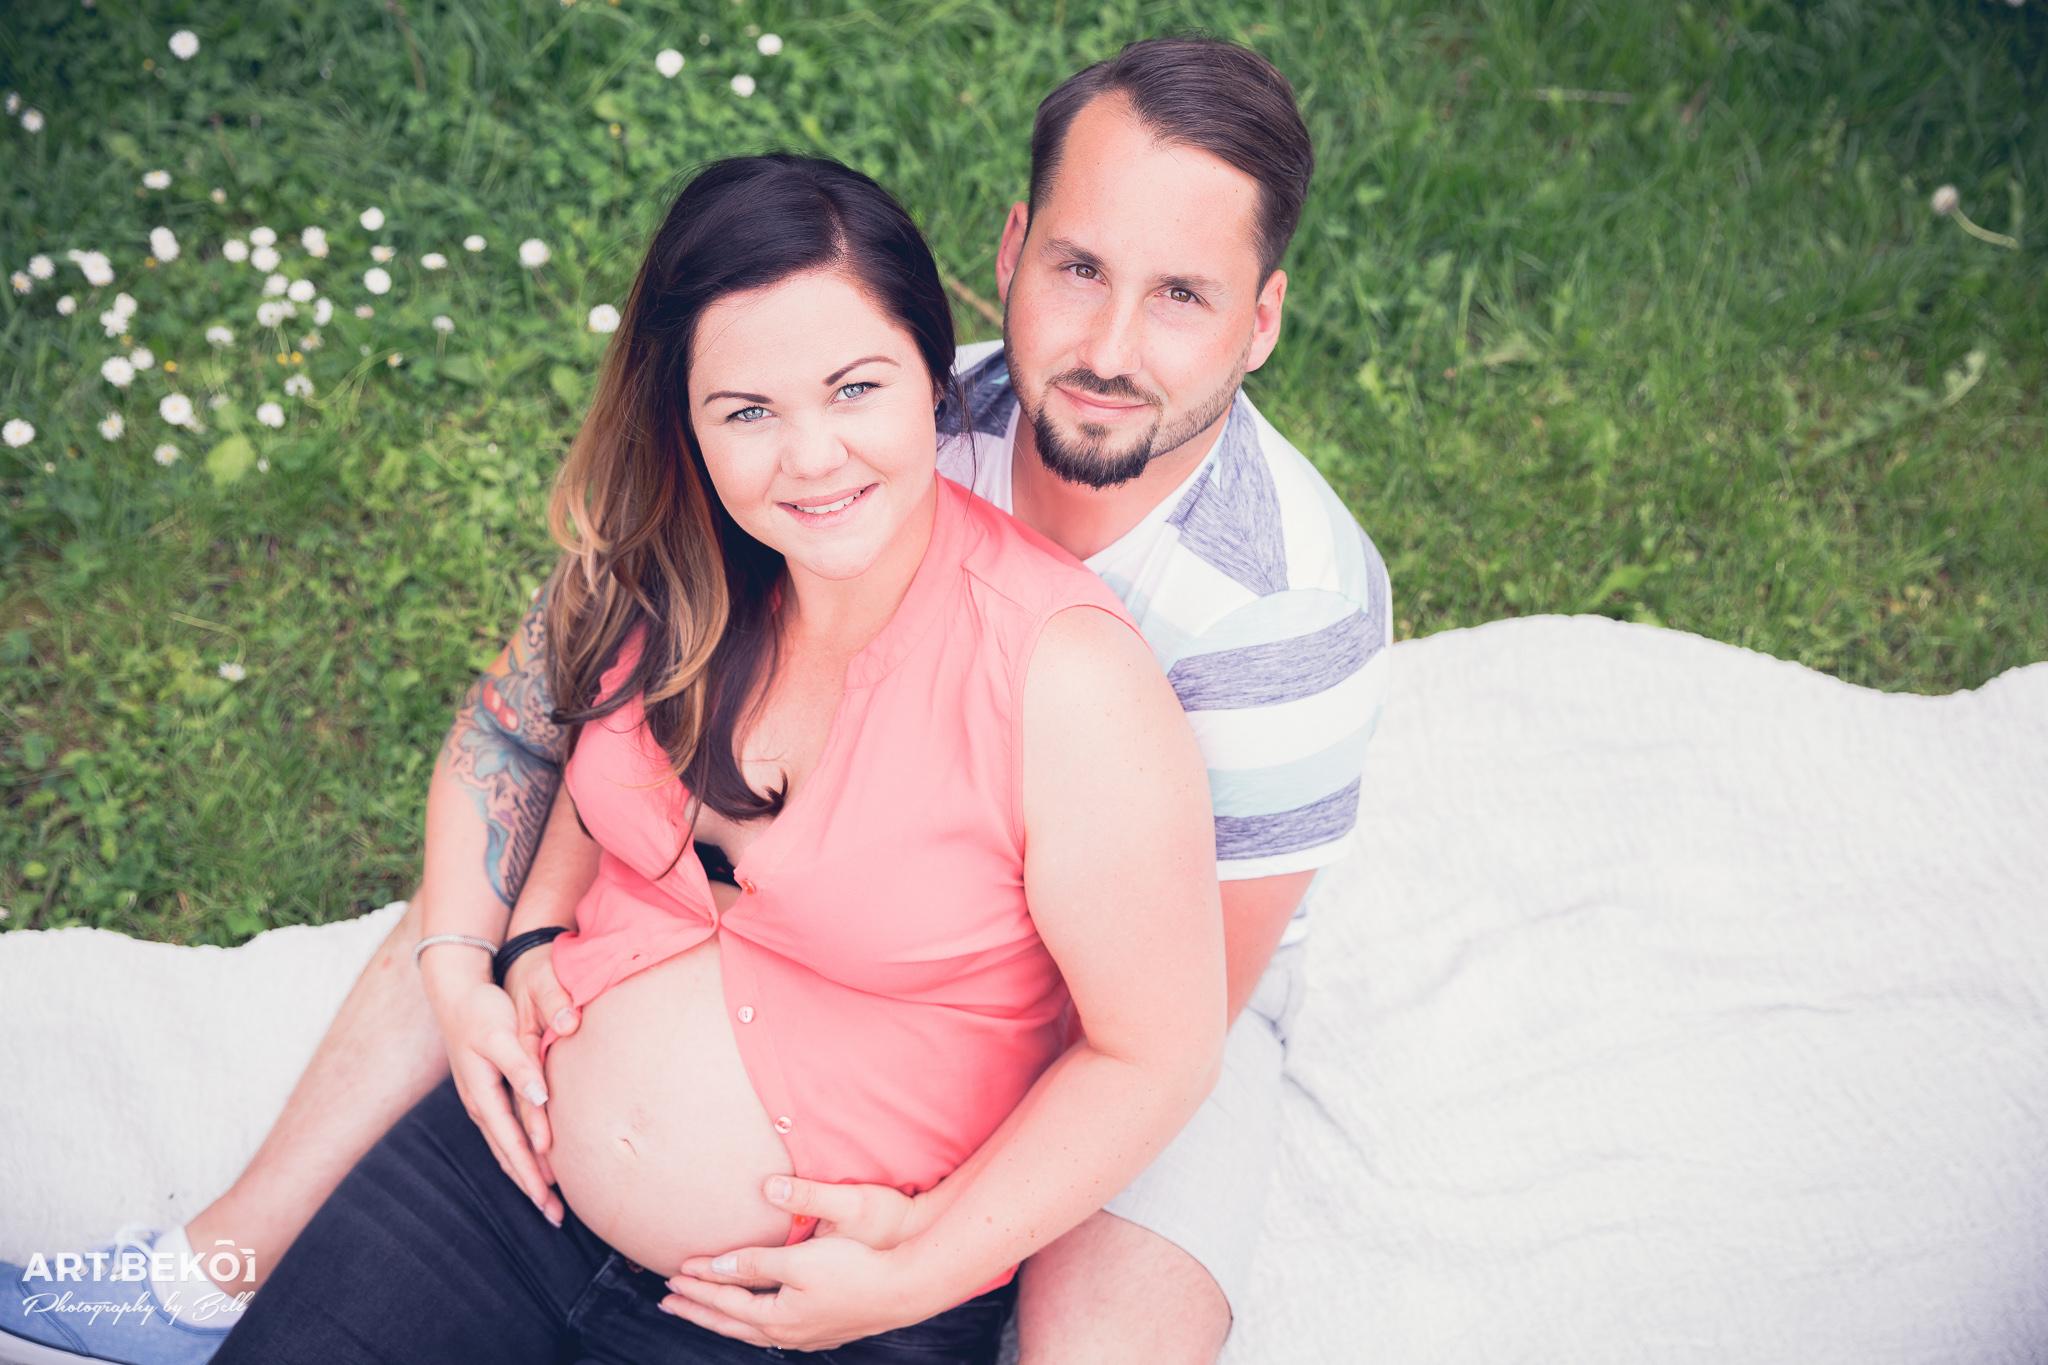 Familienshooting | Babybauch Caro & Hannes